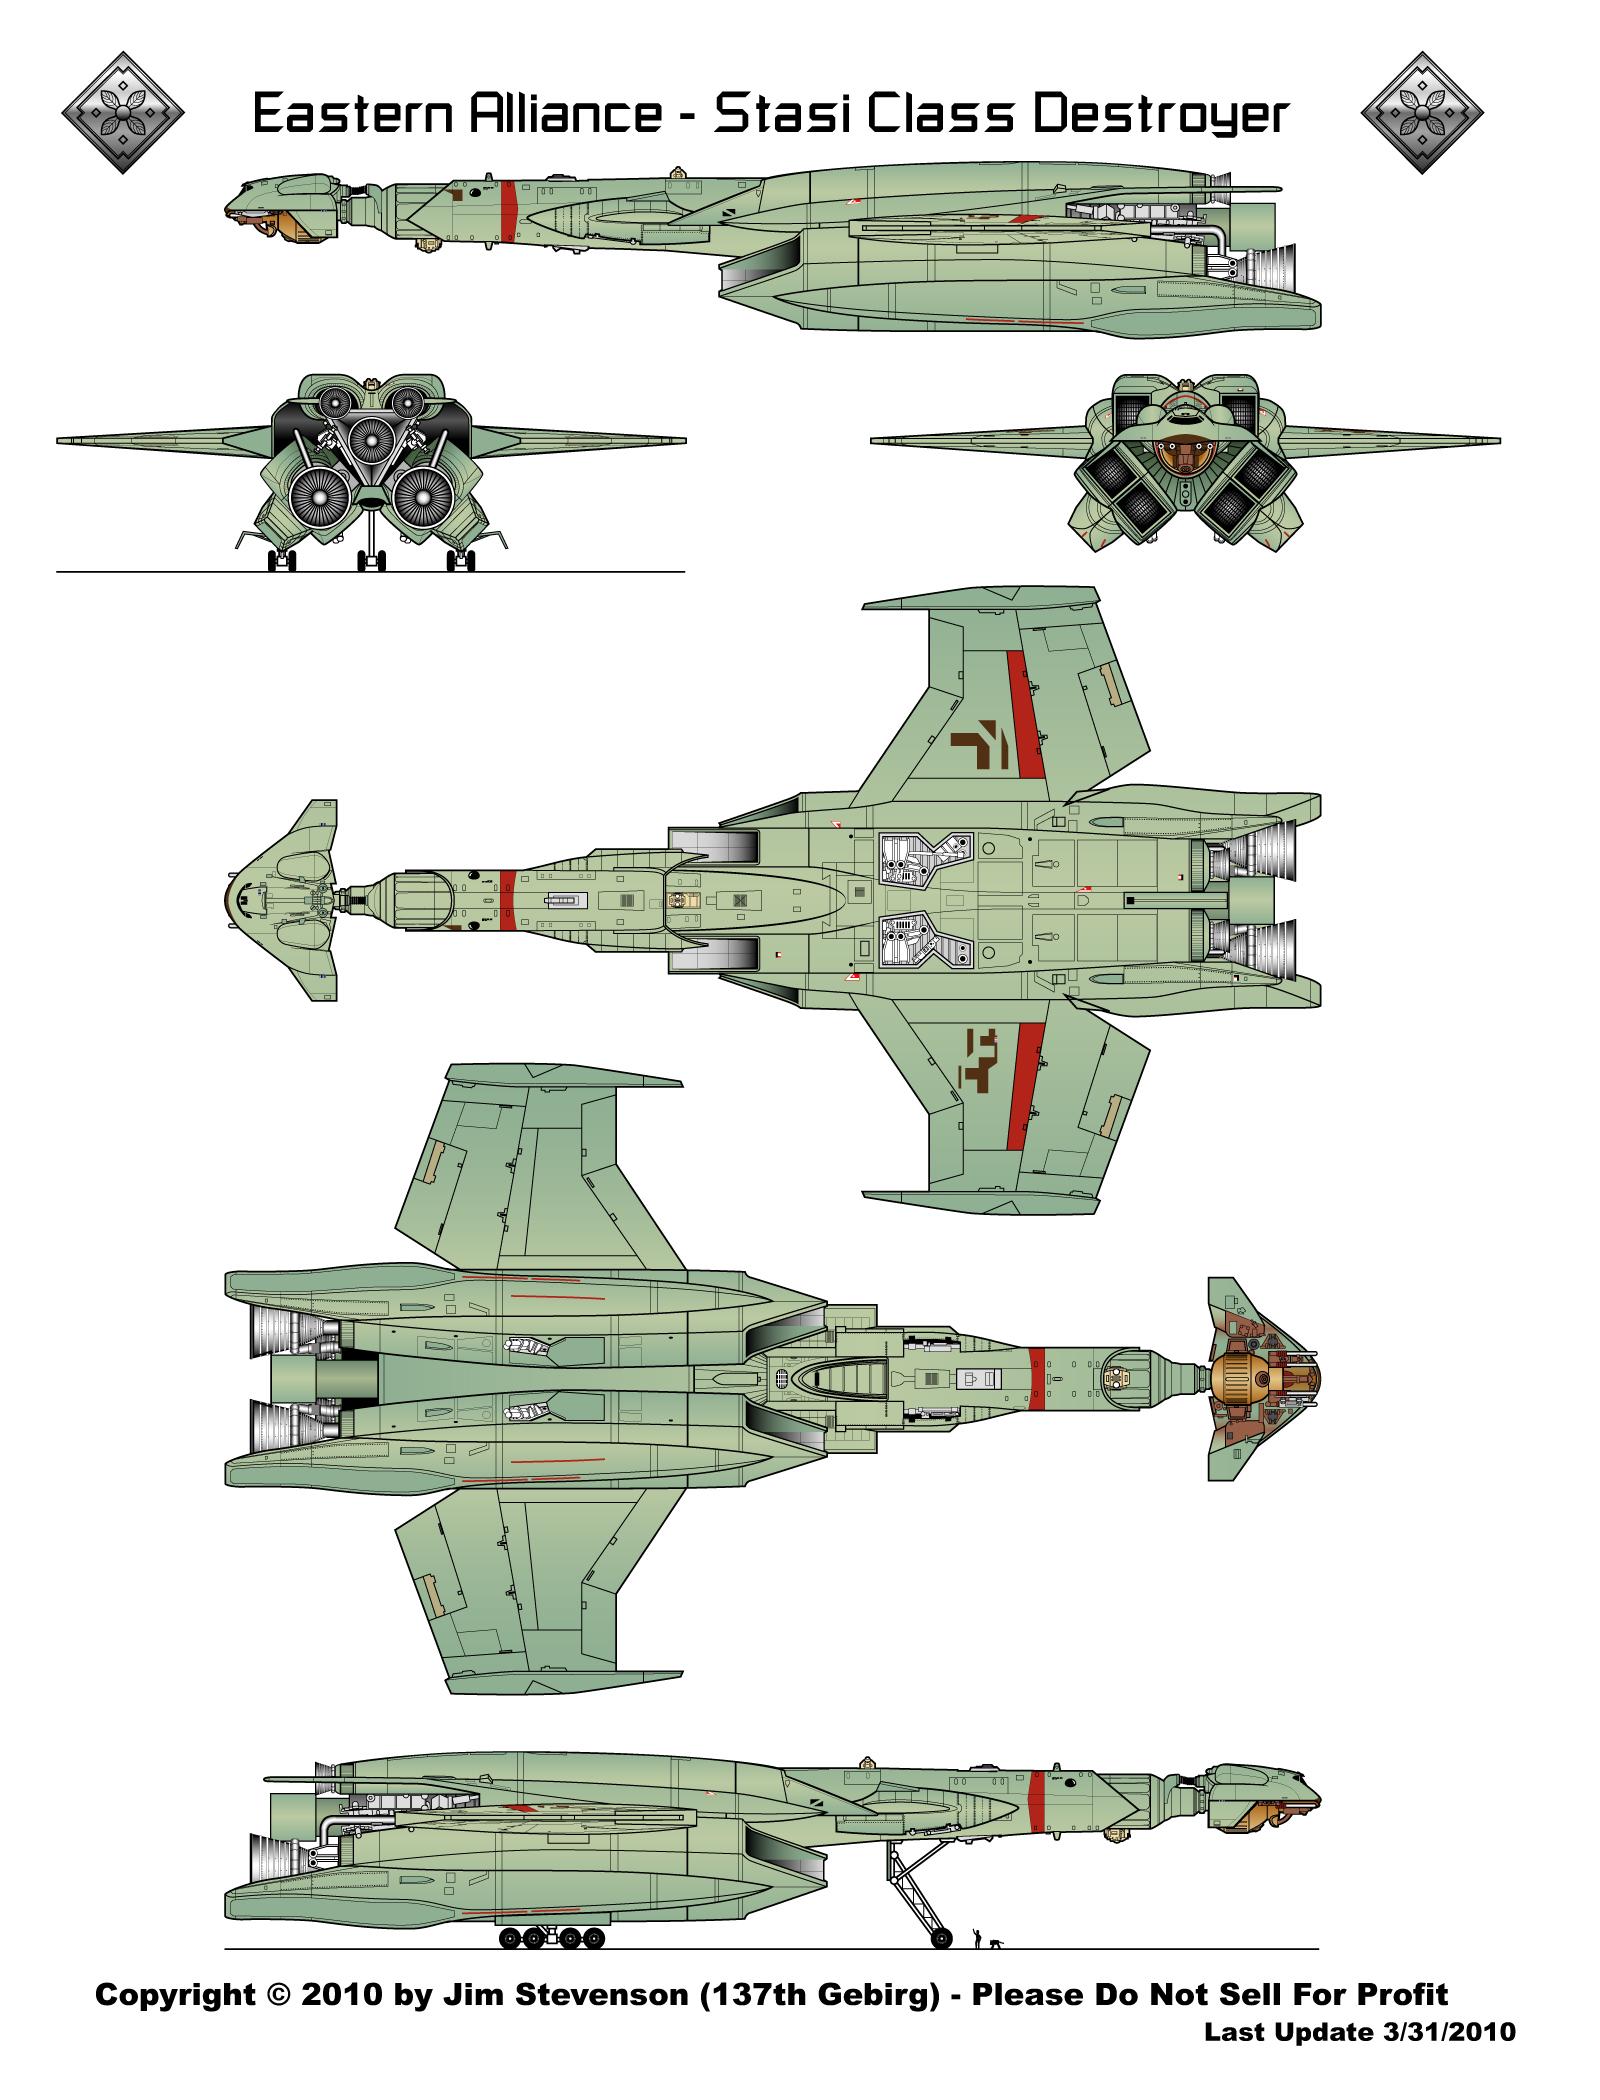 Eastern_Alliance_Destroyer.jpg